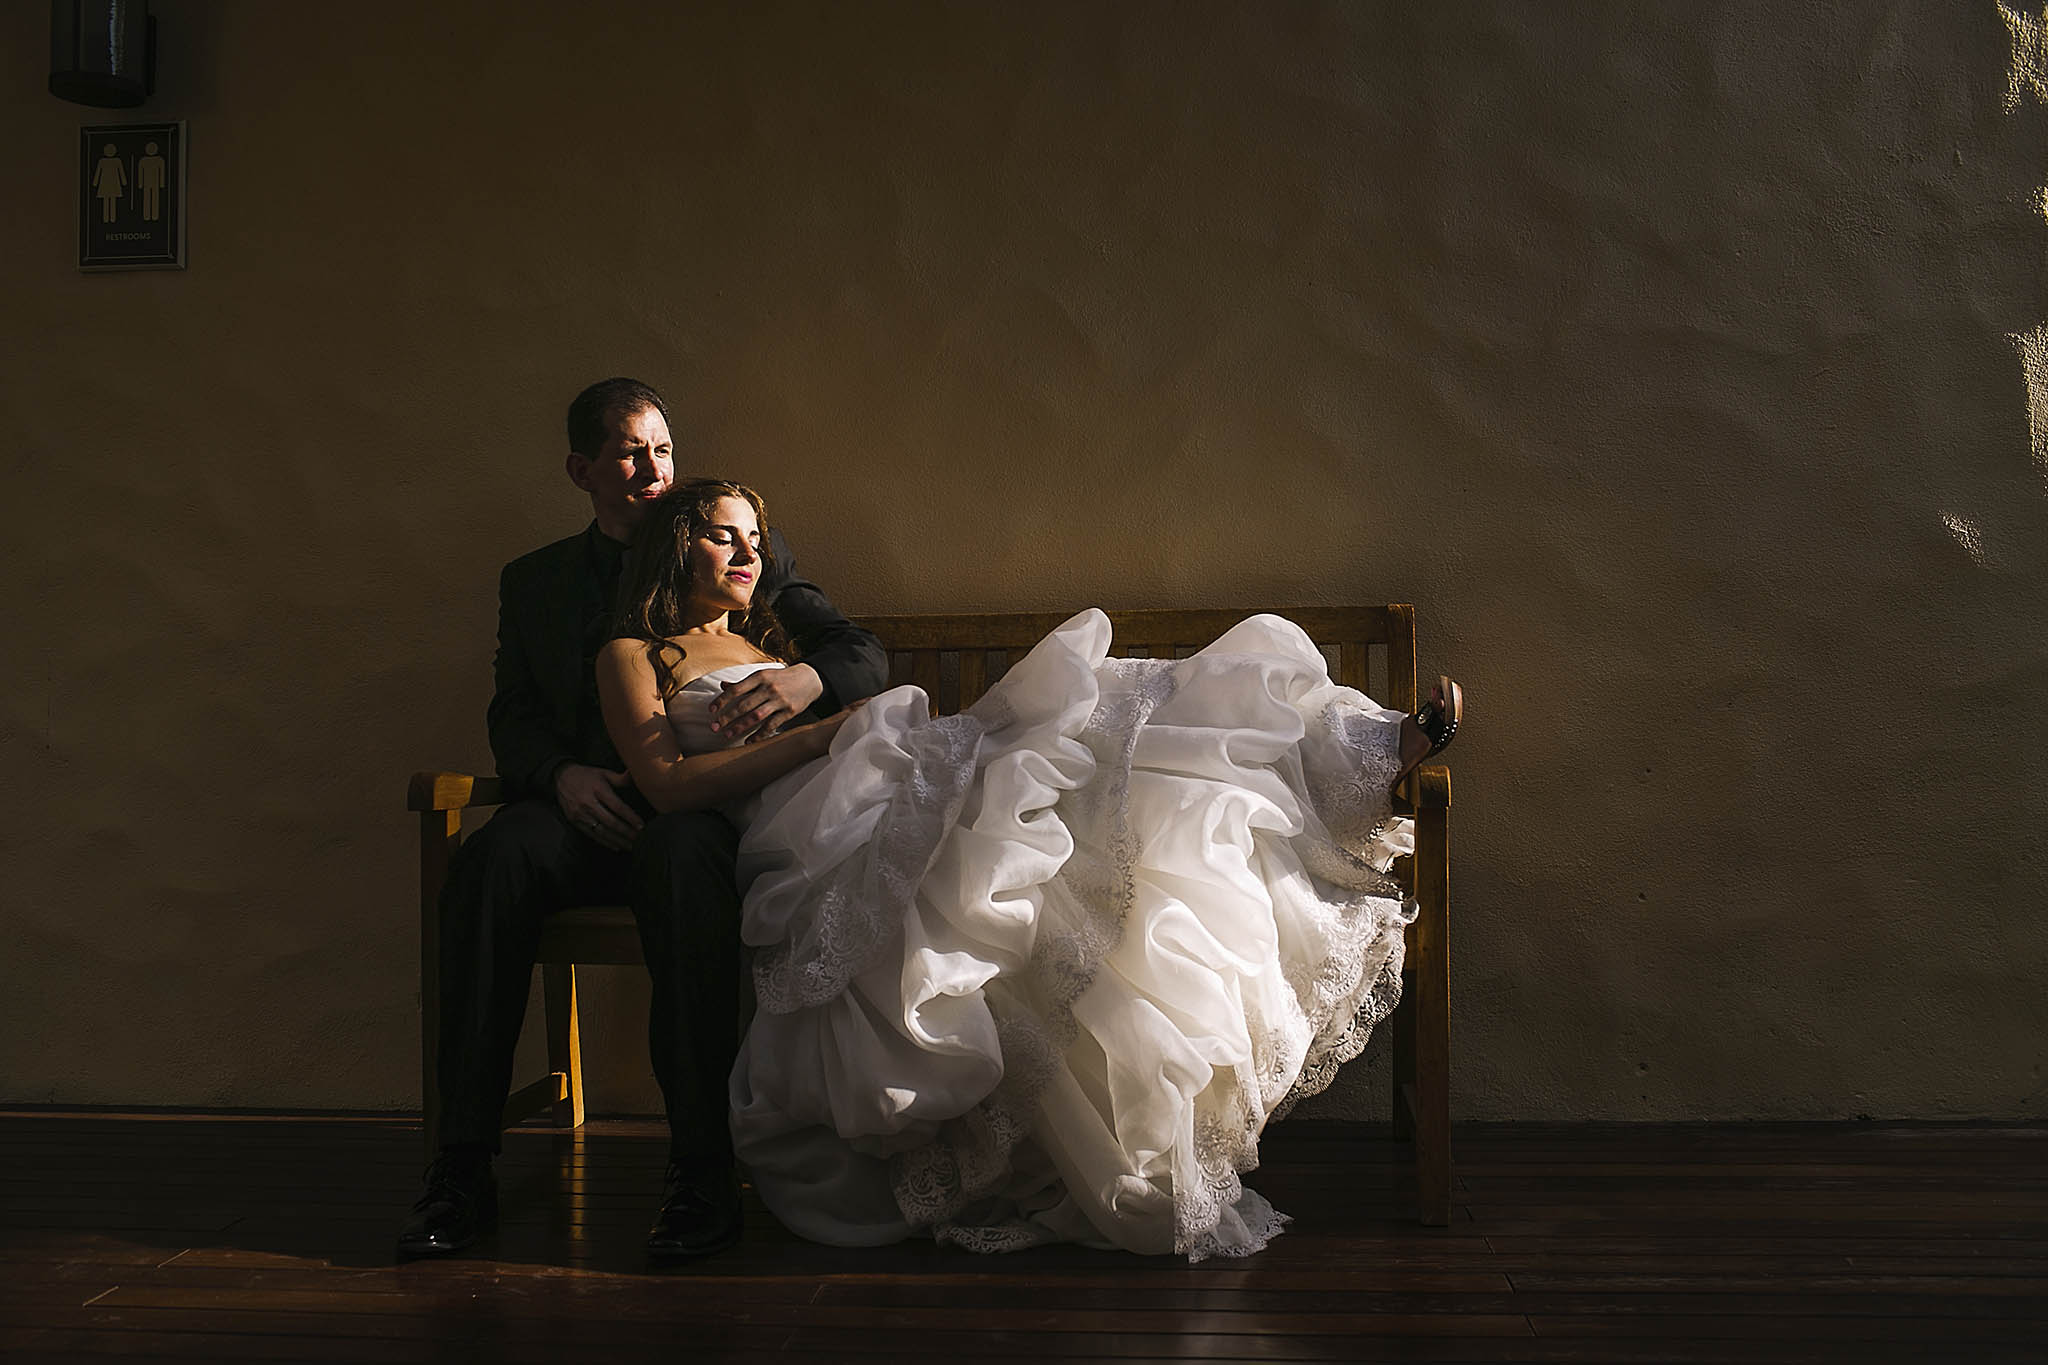 Wedding photographer Sayulita